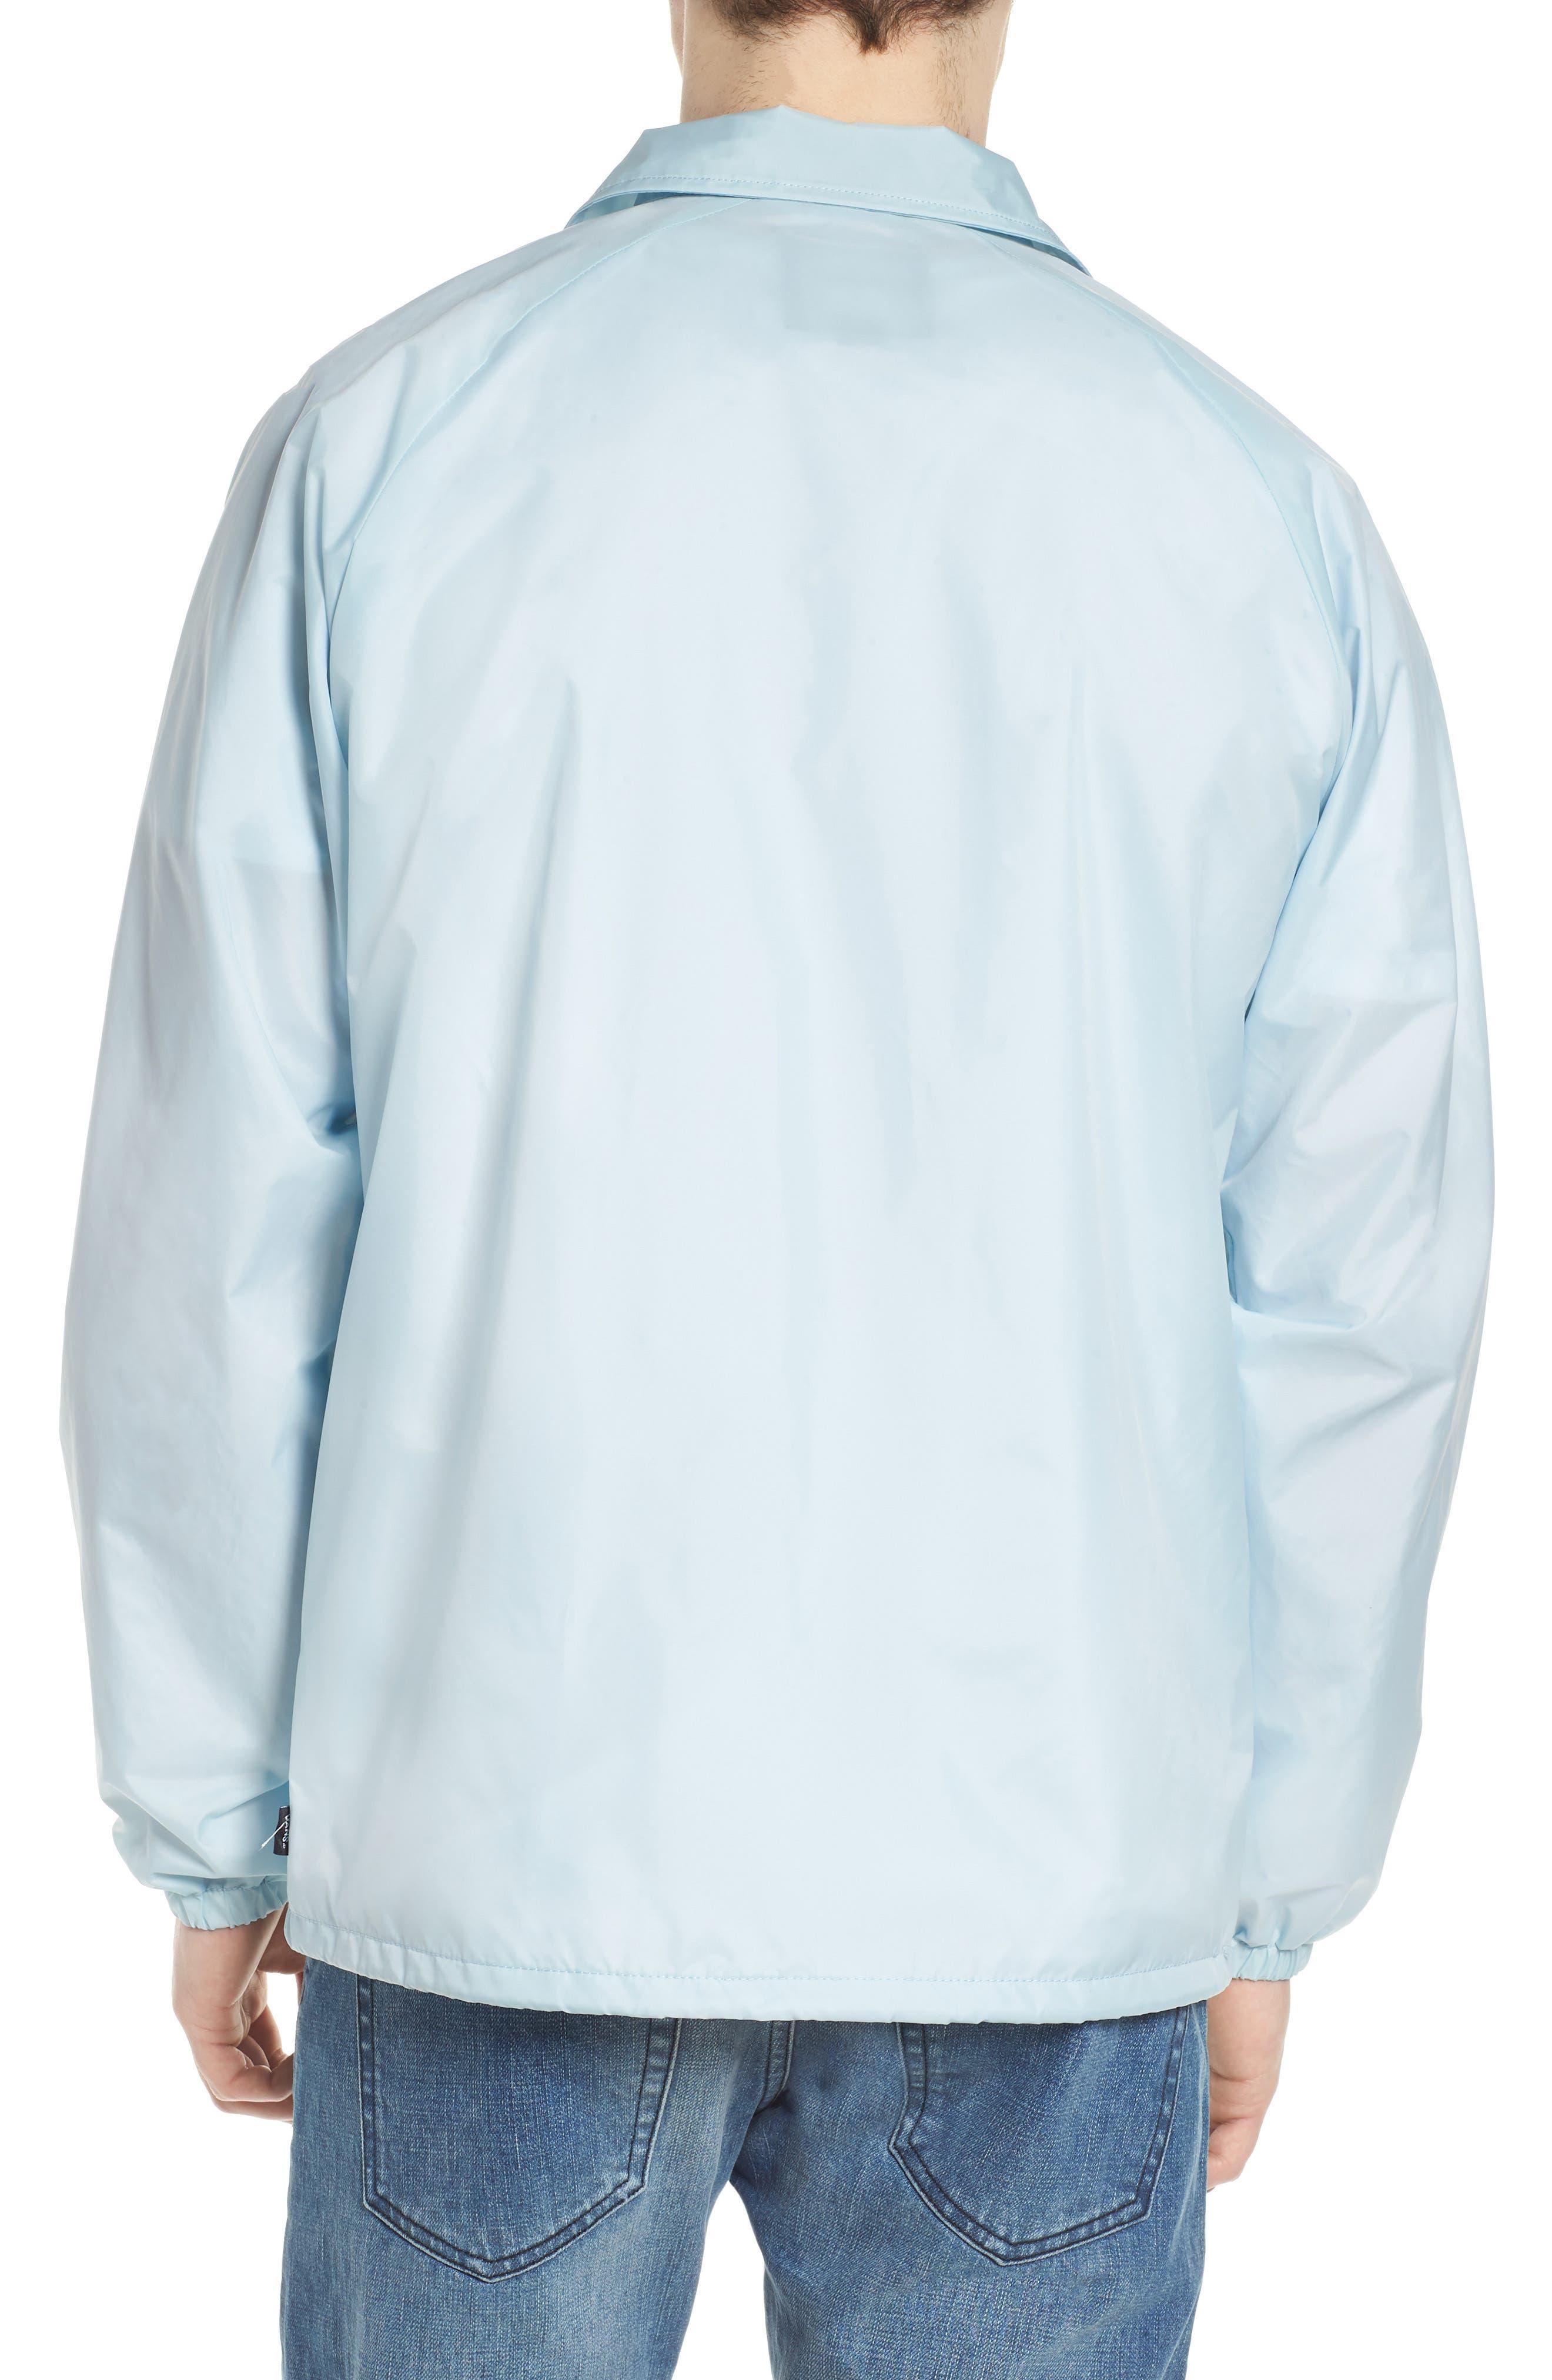 Torrey Water Resistant Jacket,                             Alternate thumbnail 2, color,                             401